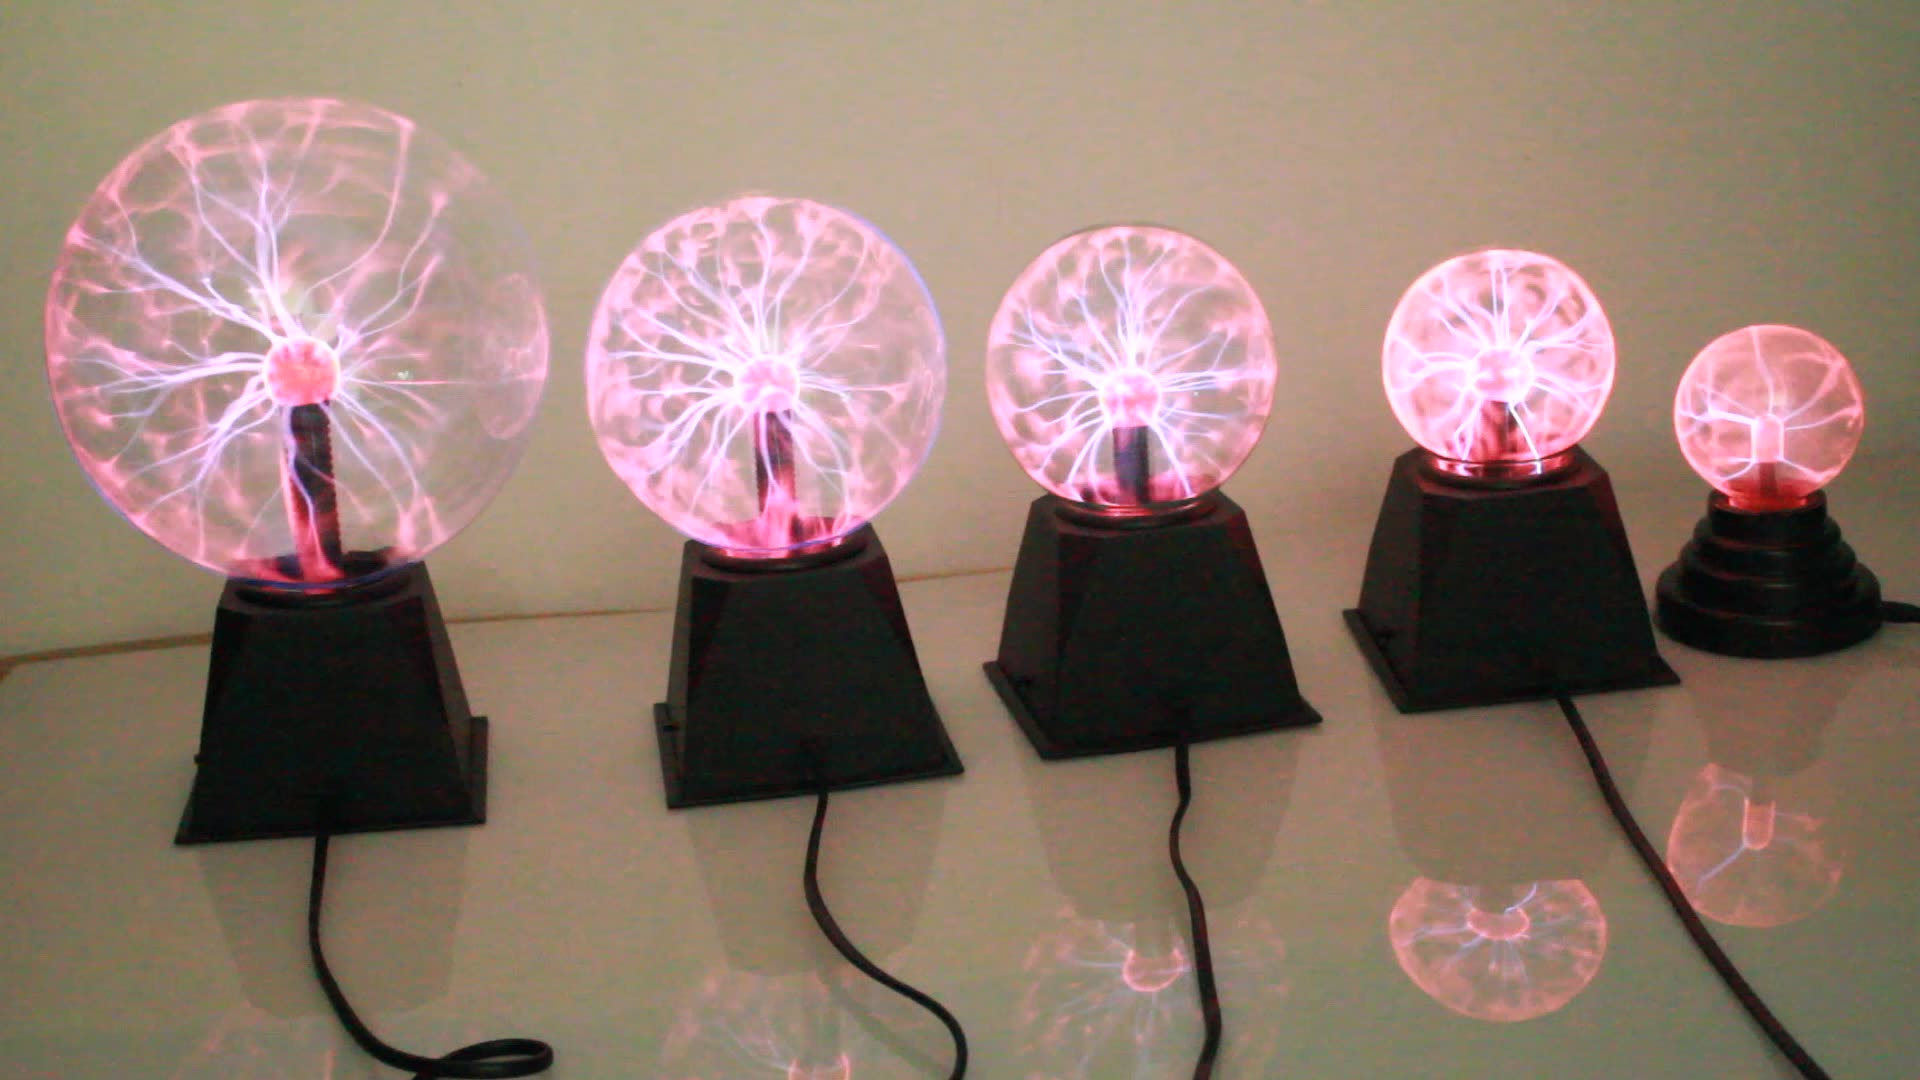 3 4 5 6 8 inch USB Plasma Ball, Magic Ball, led light magic spinning ball